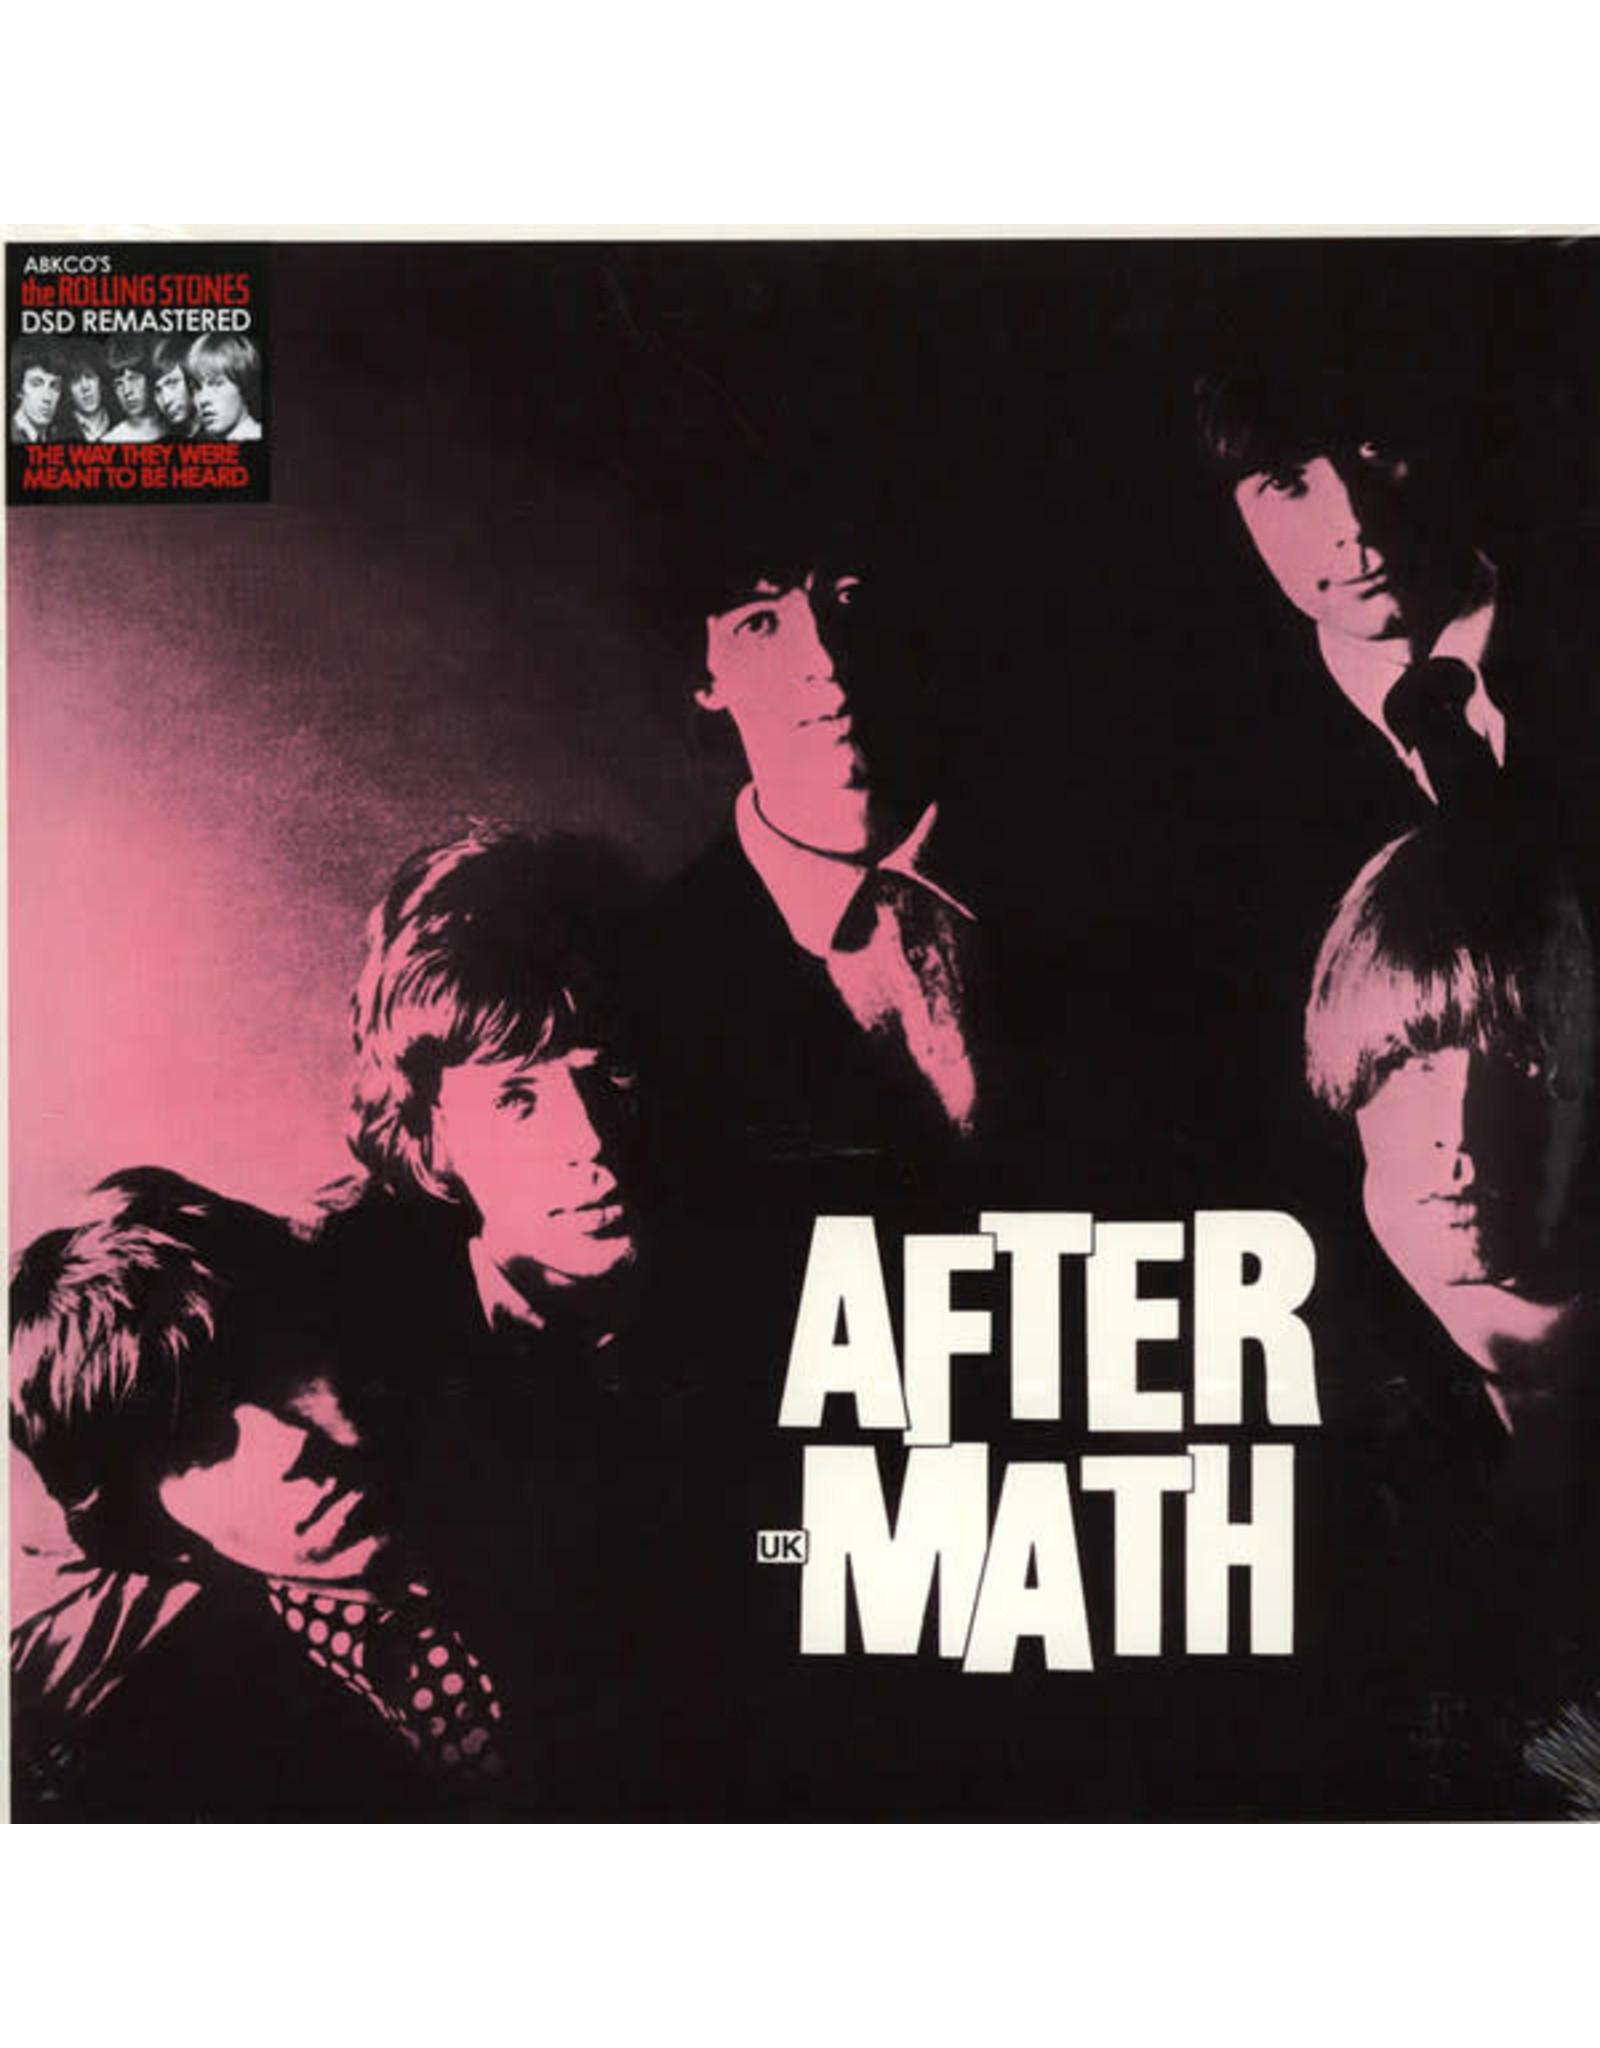 Rolling Stones - Aftermath (UK) LP